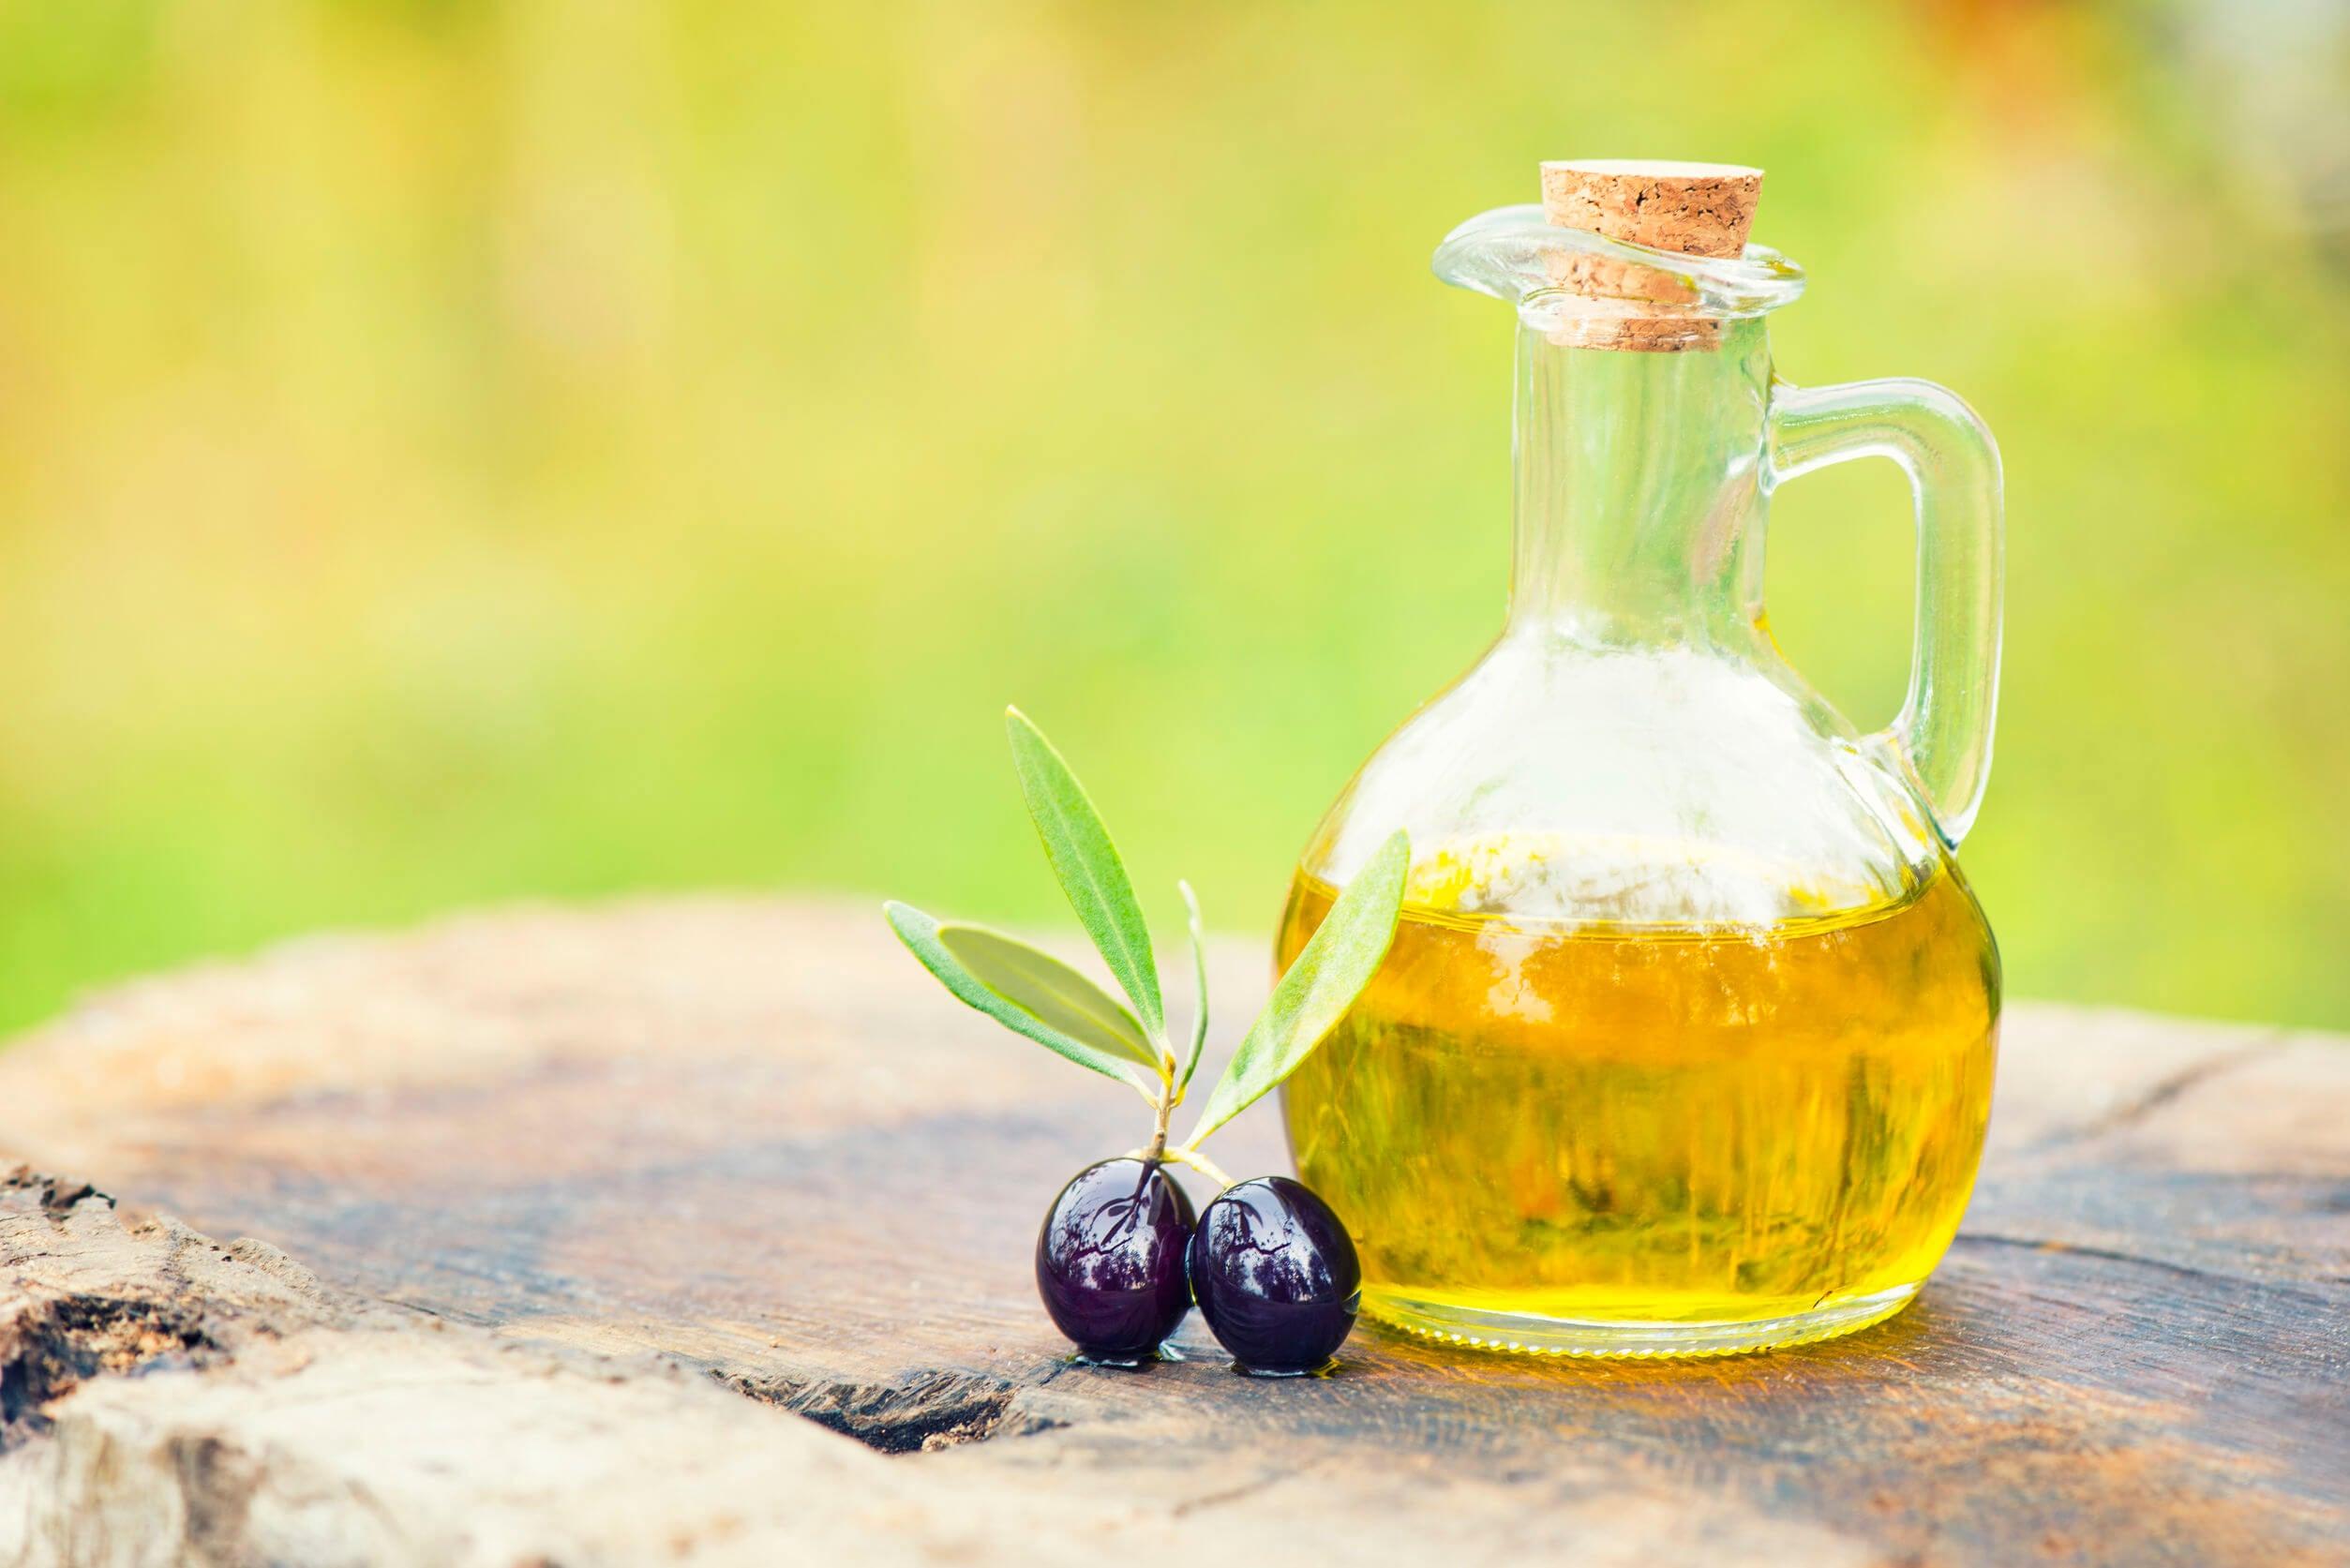 Olive oil is good in pregnancy.